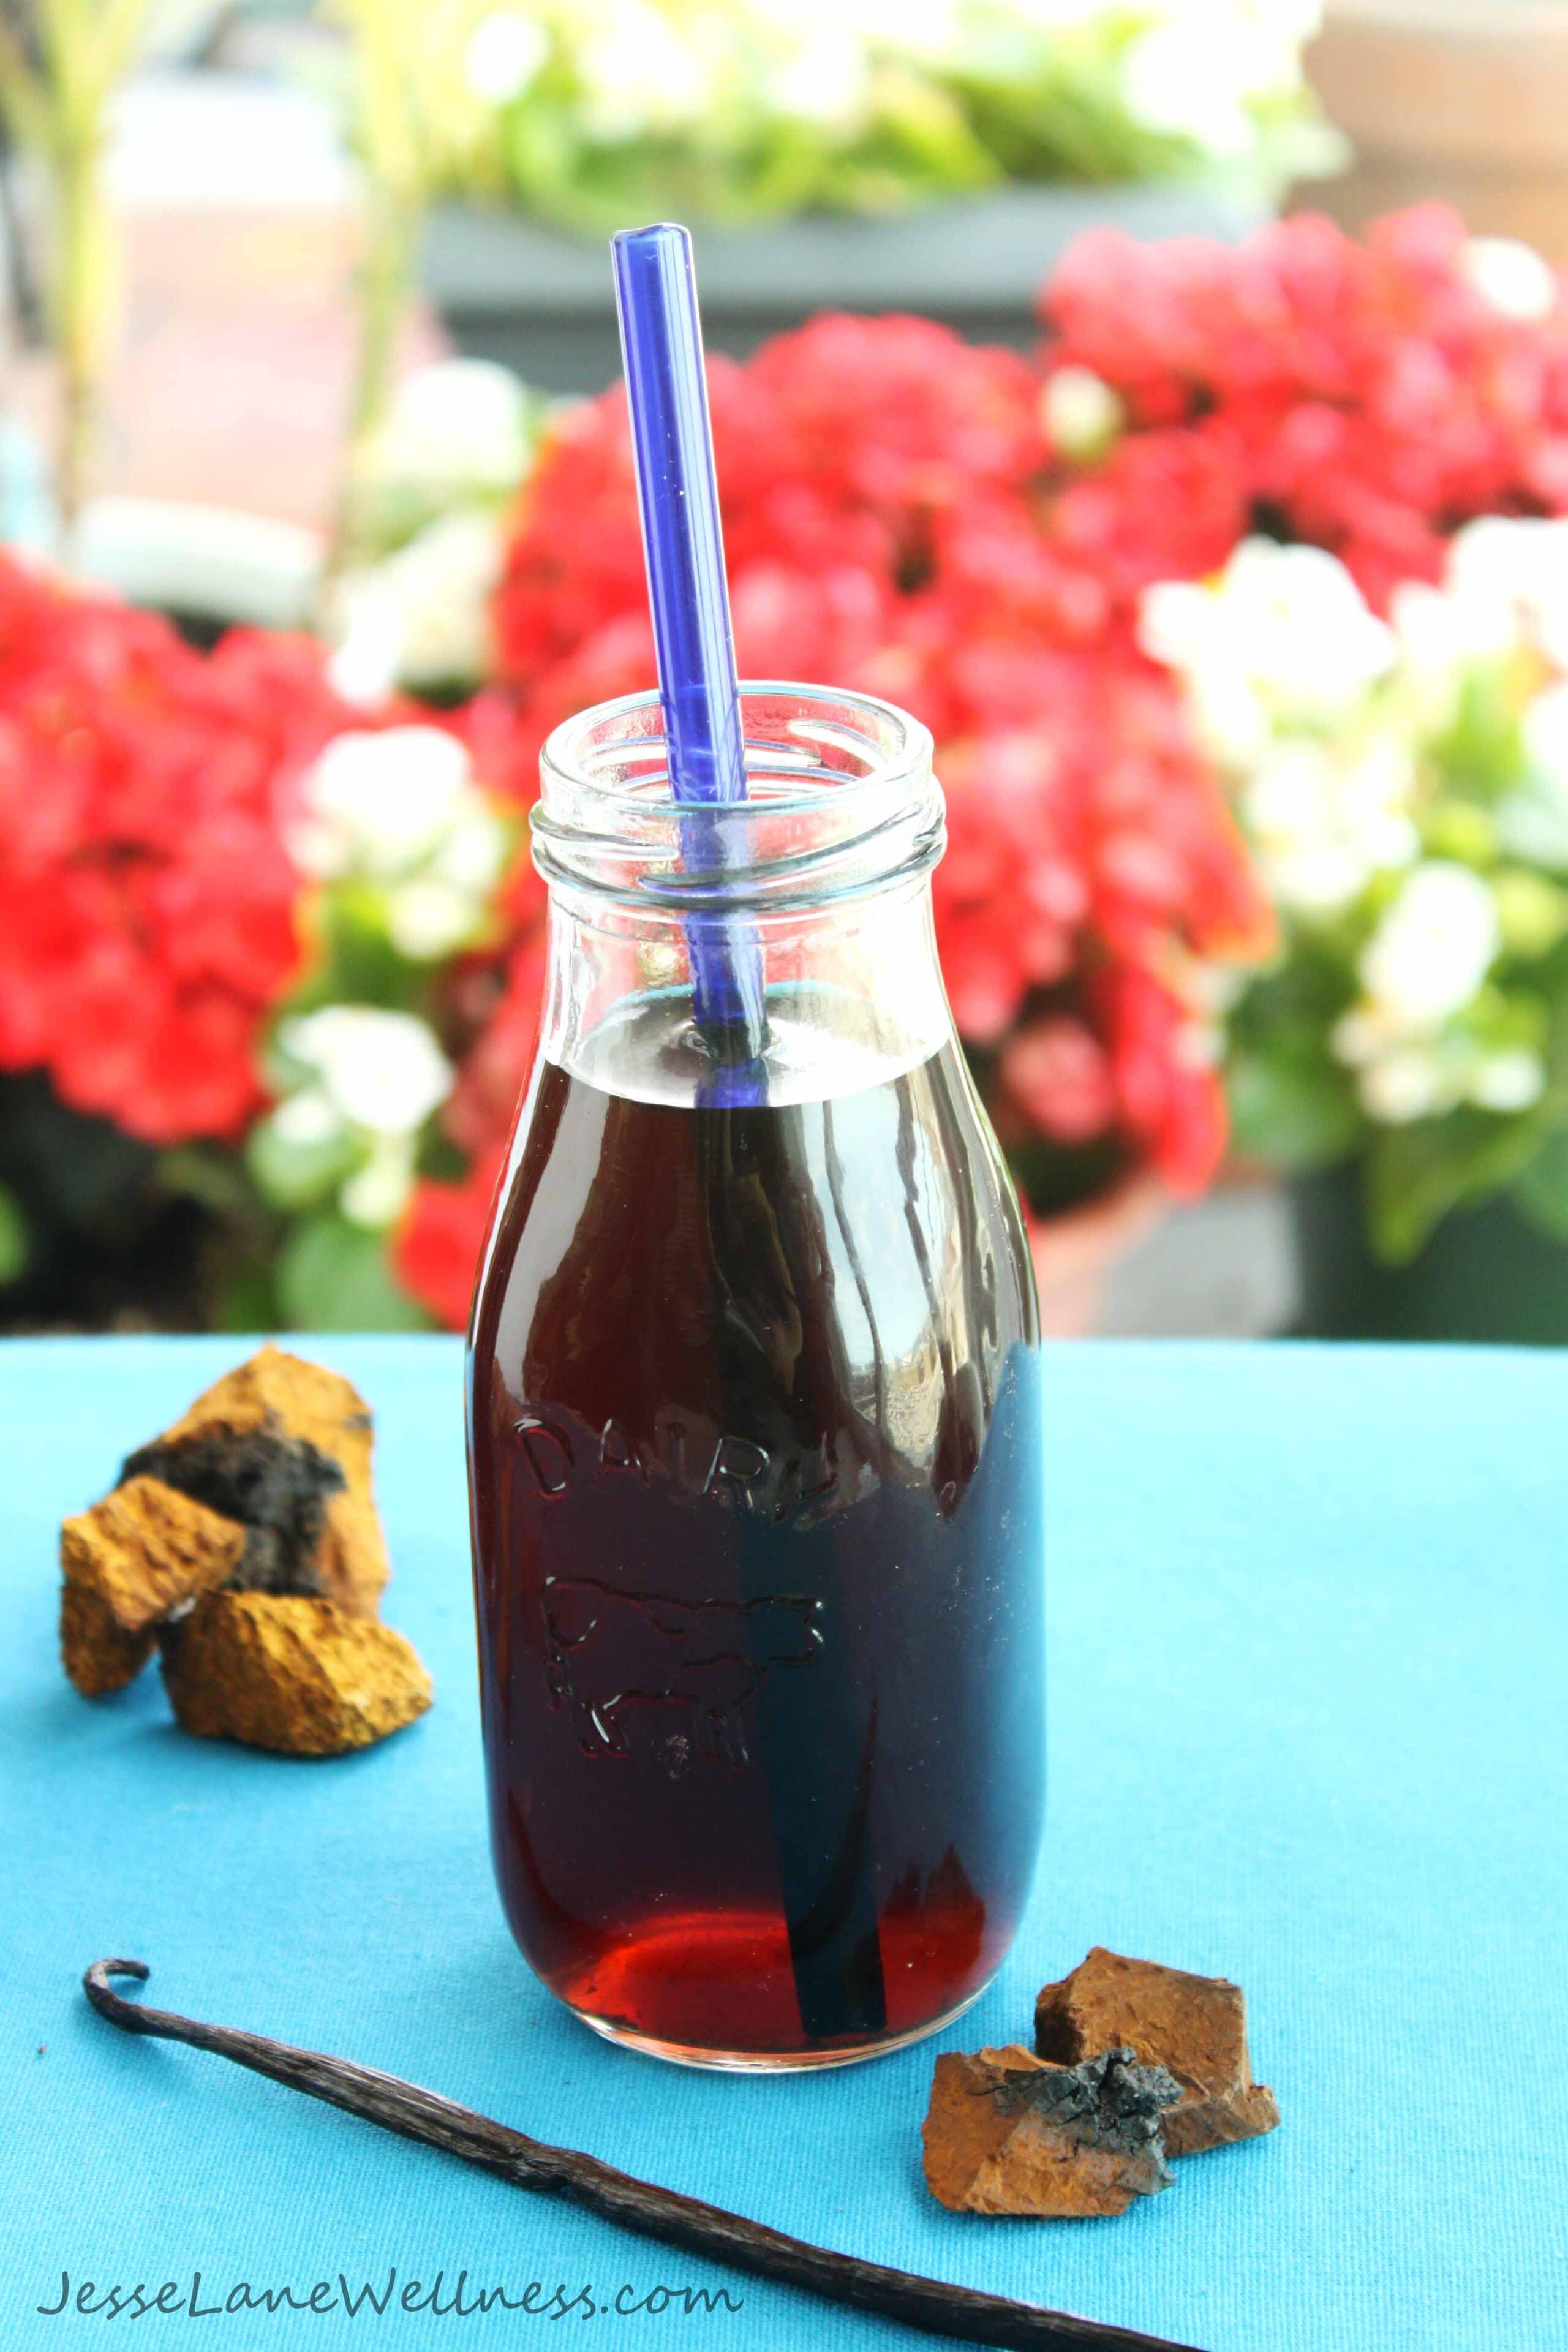 Chaga Mushroom Tea Recipes by Jesse Lane Wellness